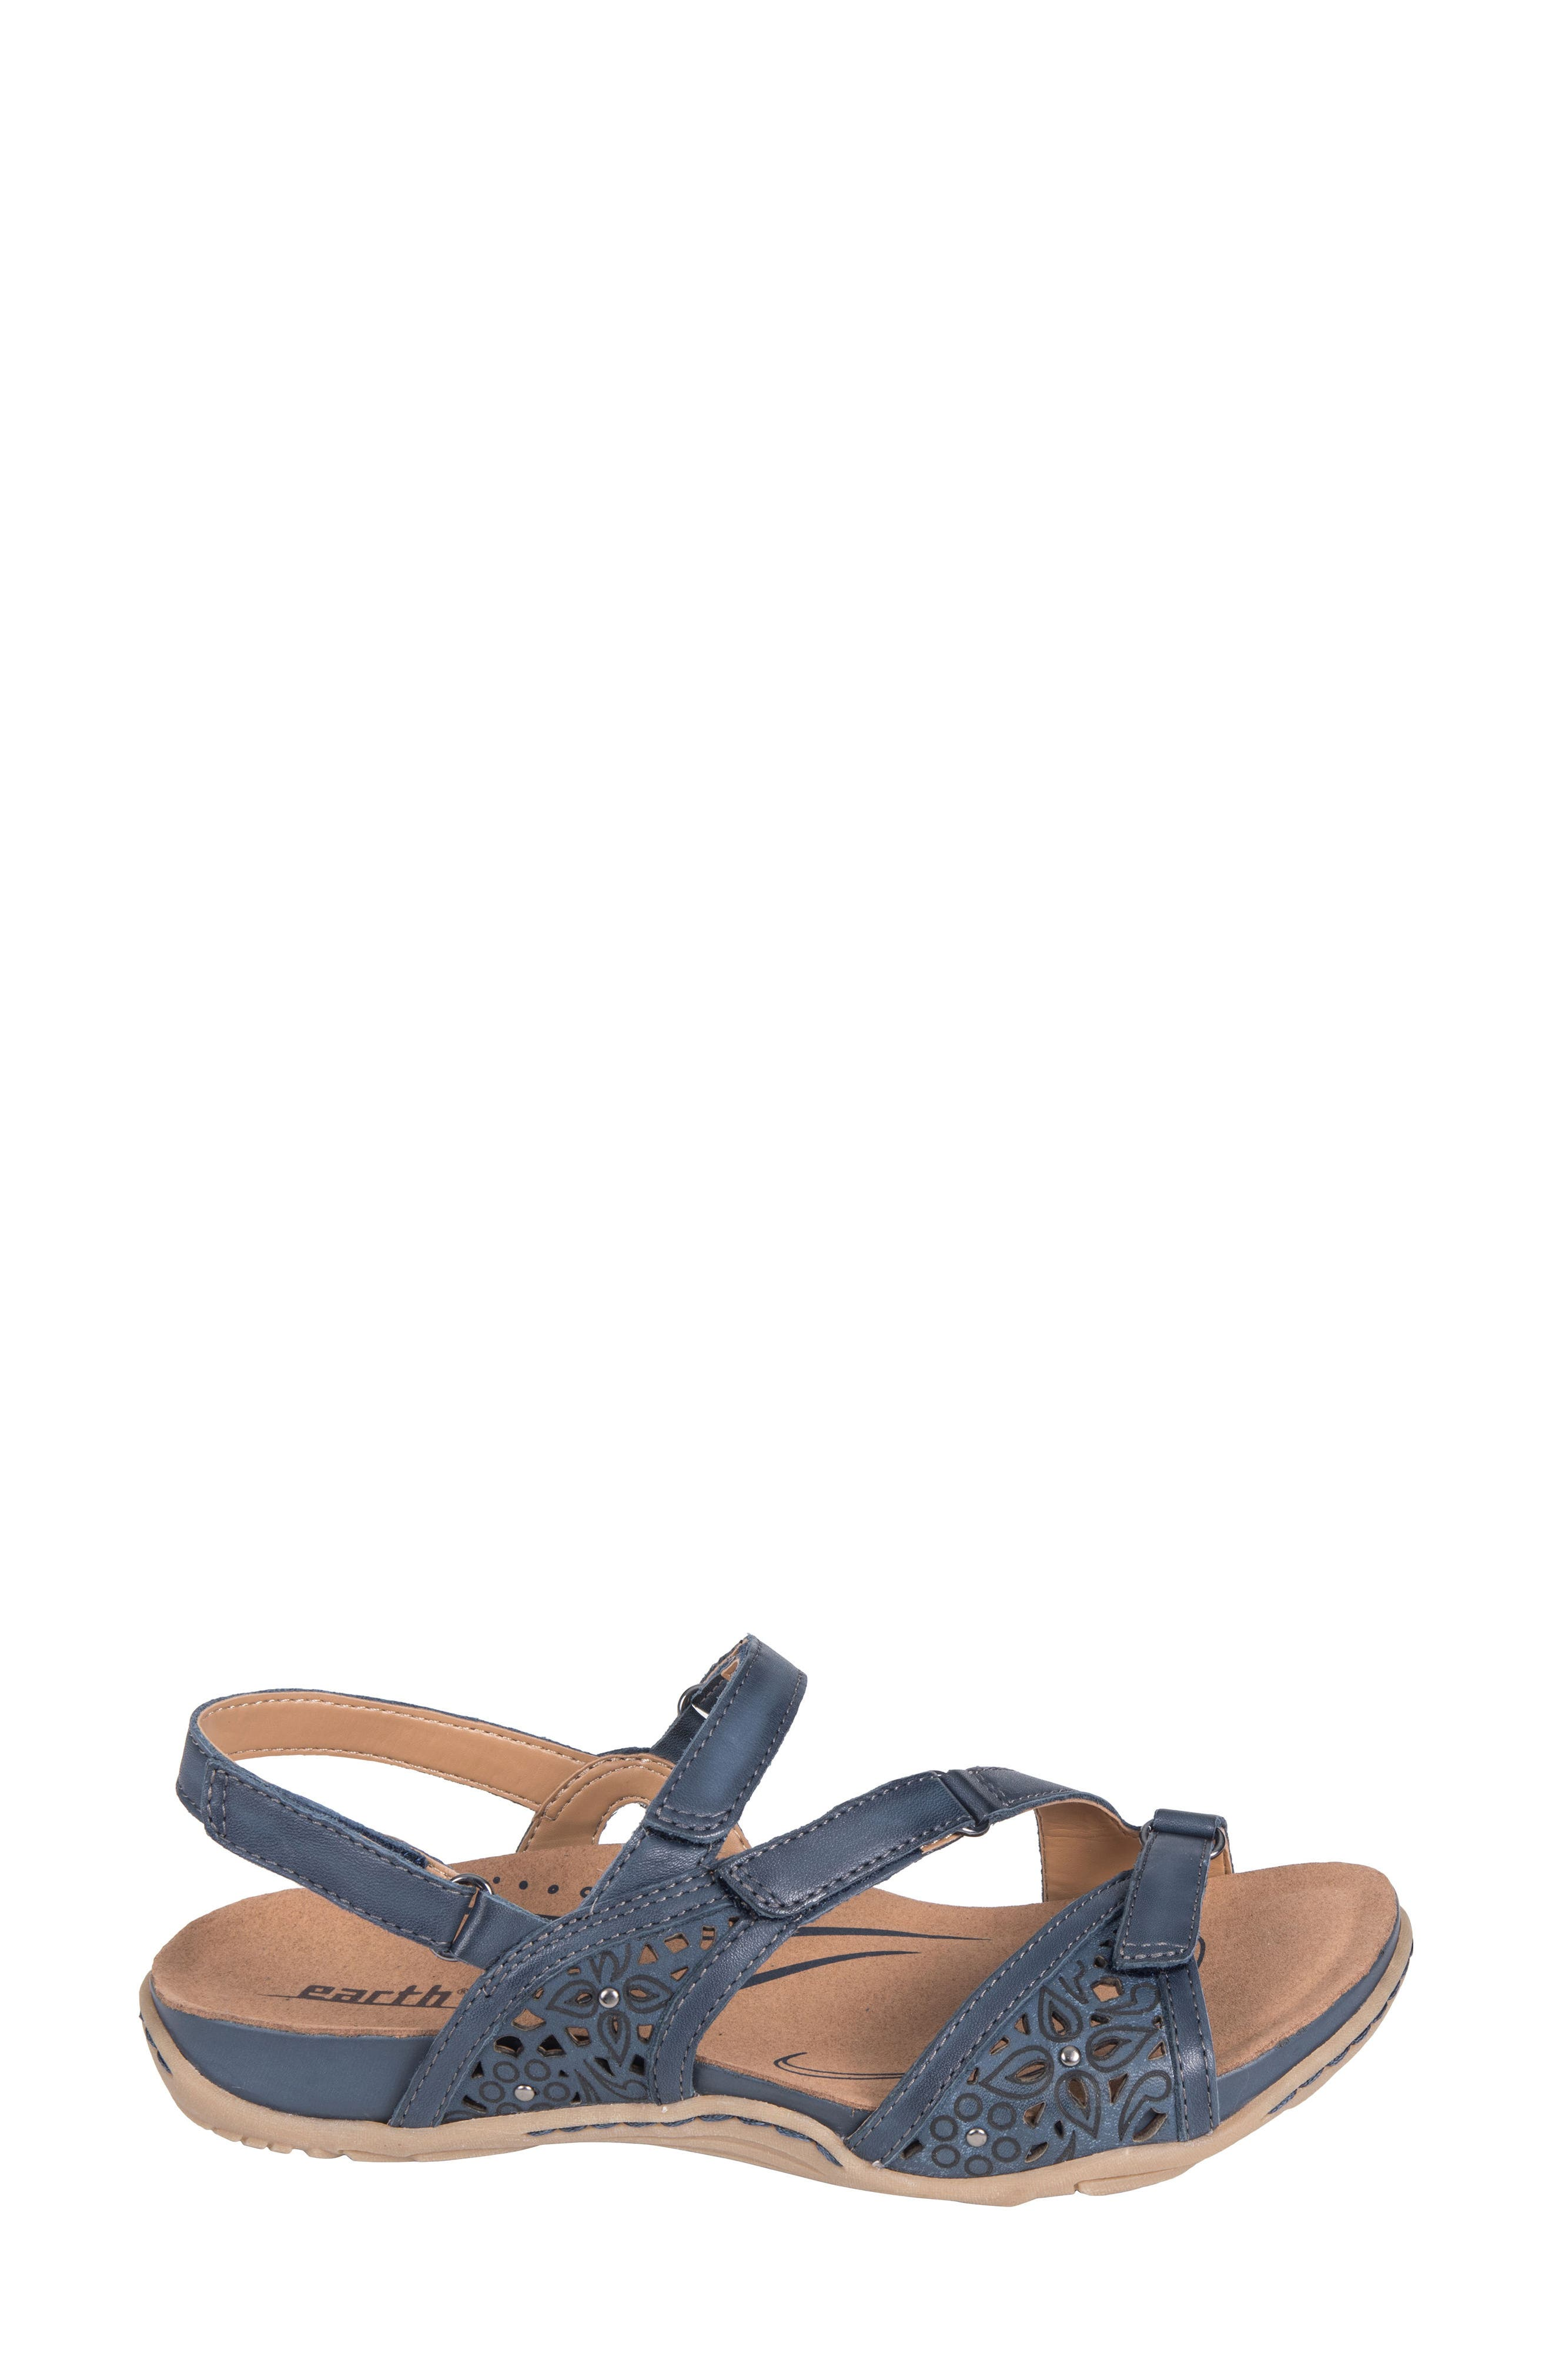 Maui Strappy Sandal,                             Alternate thumbnail 3, color,                             INDIGO BLUE LEATHER